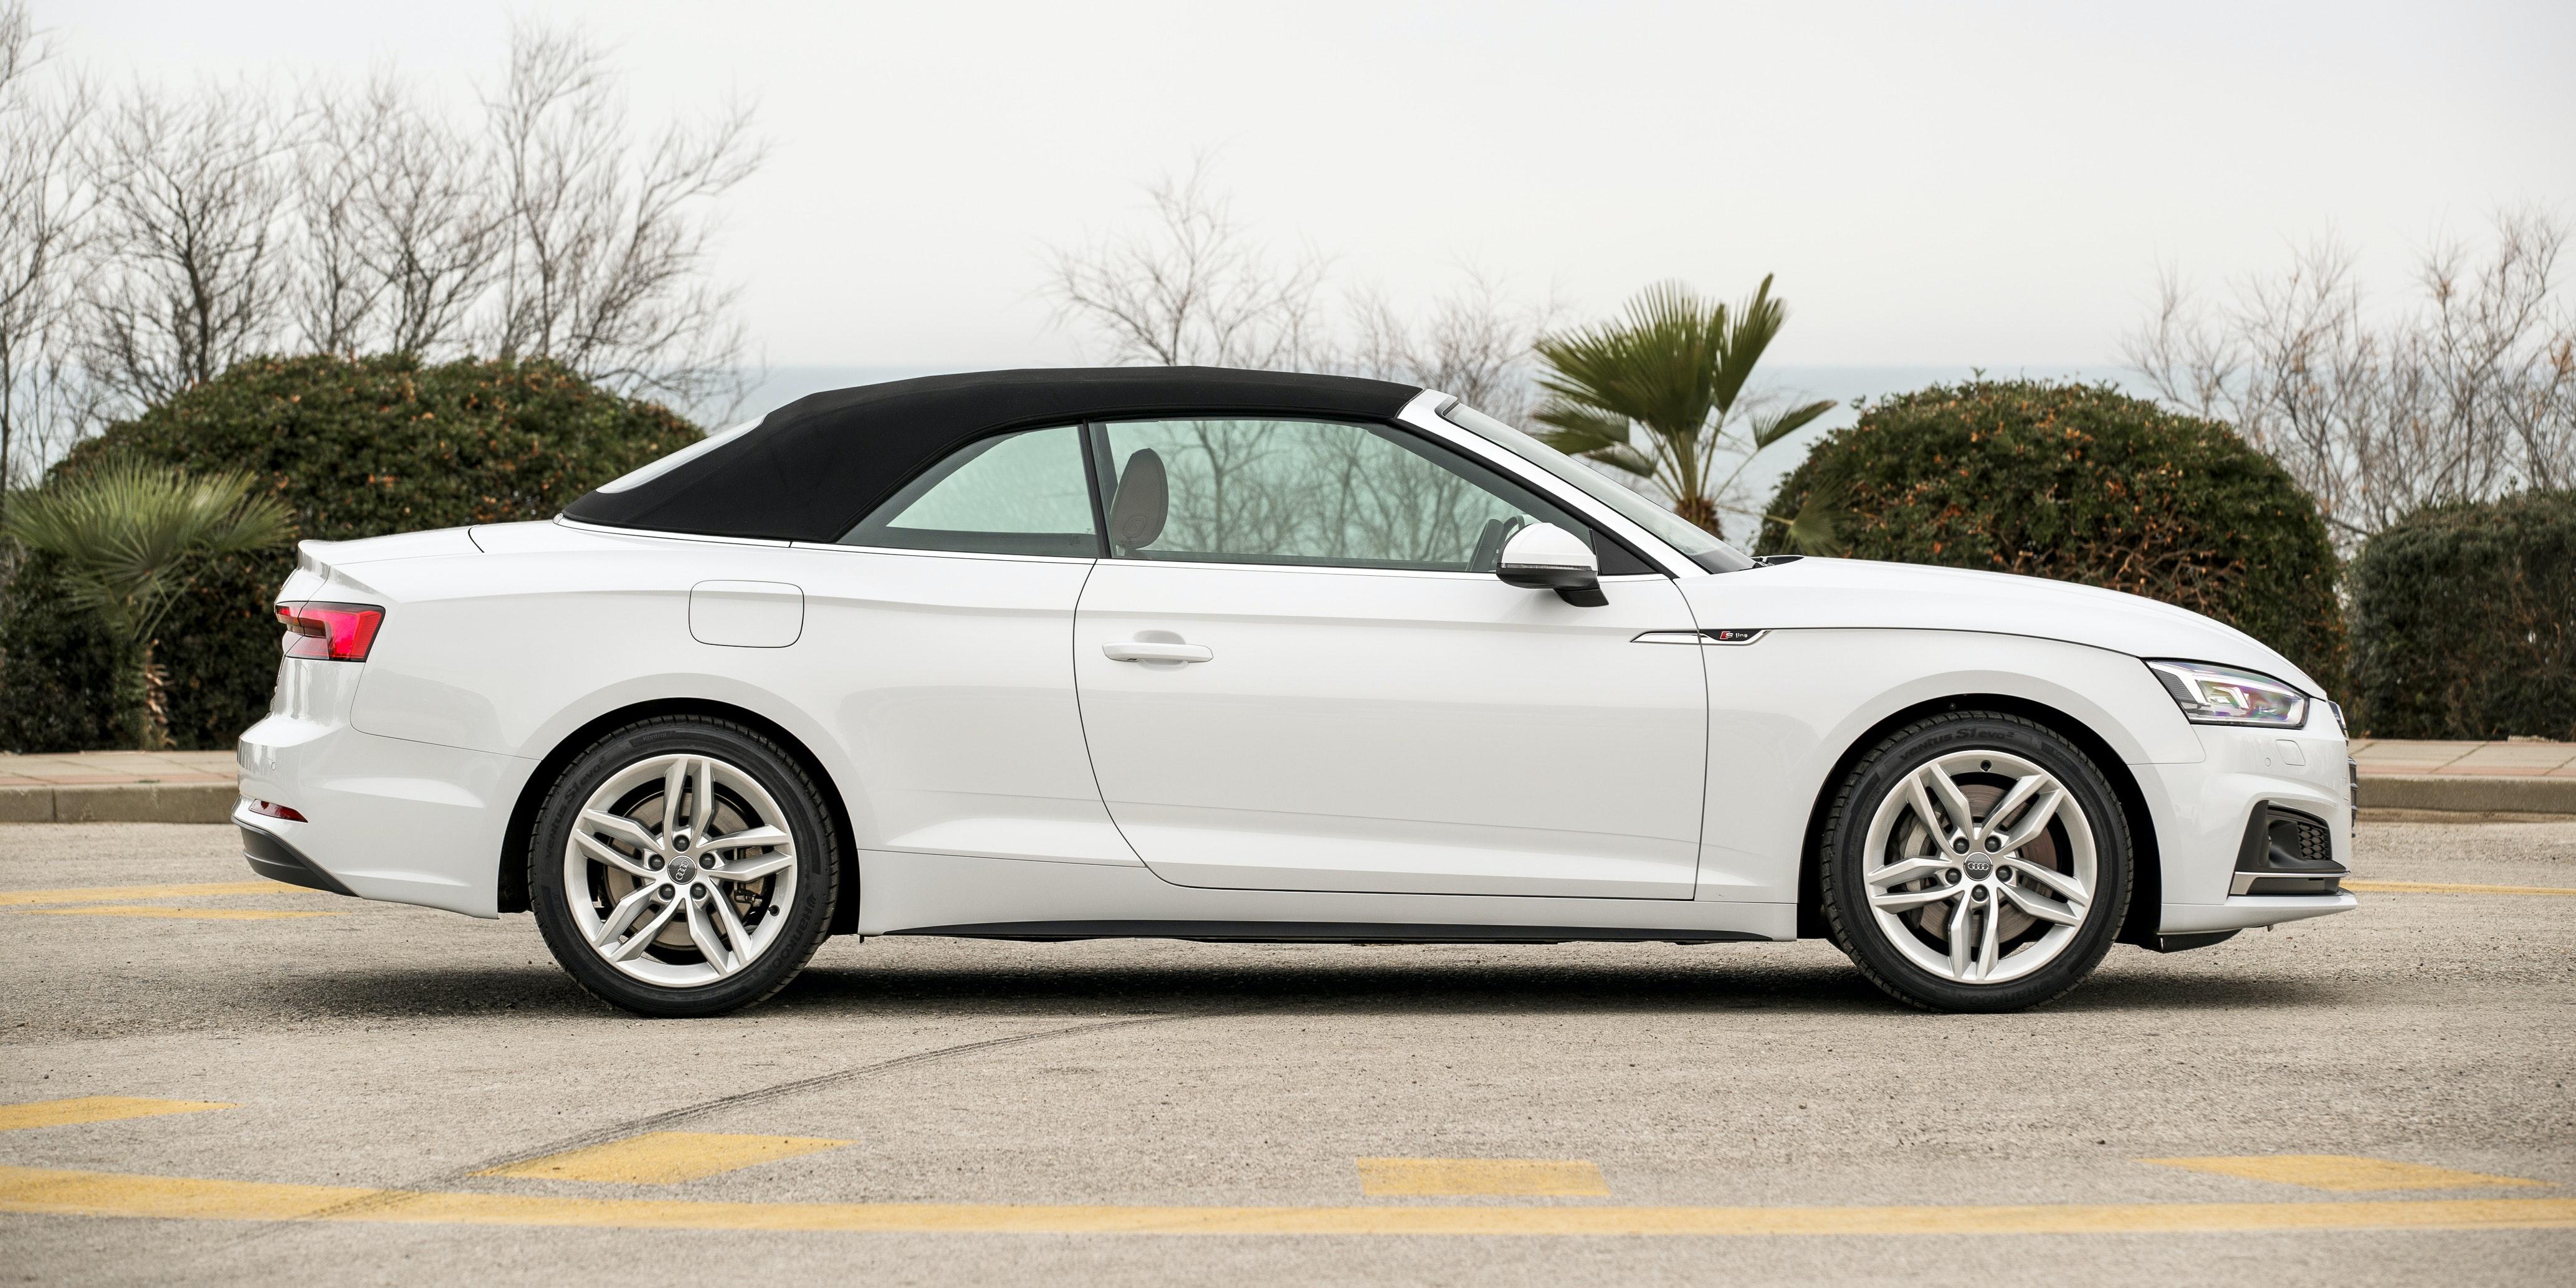 New Jeep Grand Cherokee Berkshire >> 100+ [ Audi Convertible ] | Audi U0027s New 2018 A5 Cabriolet Is Predictably Familiar,Audi A3 ...